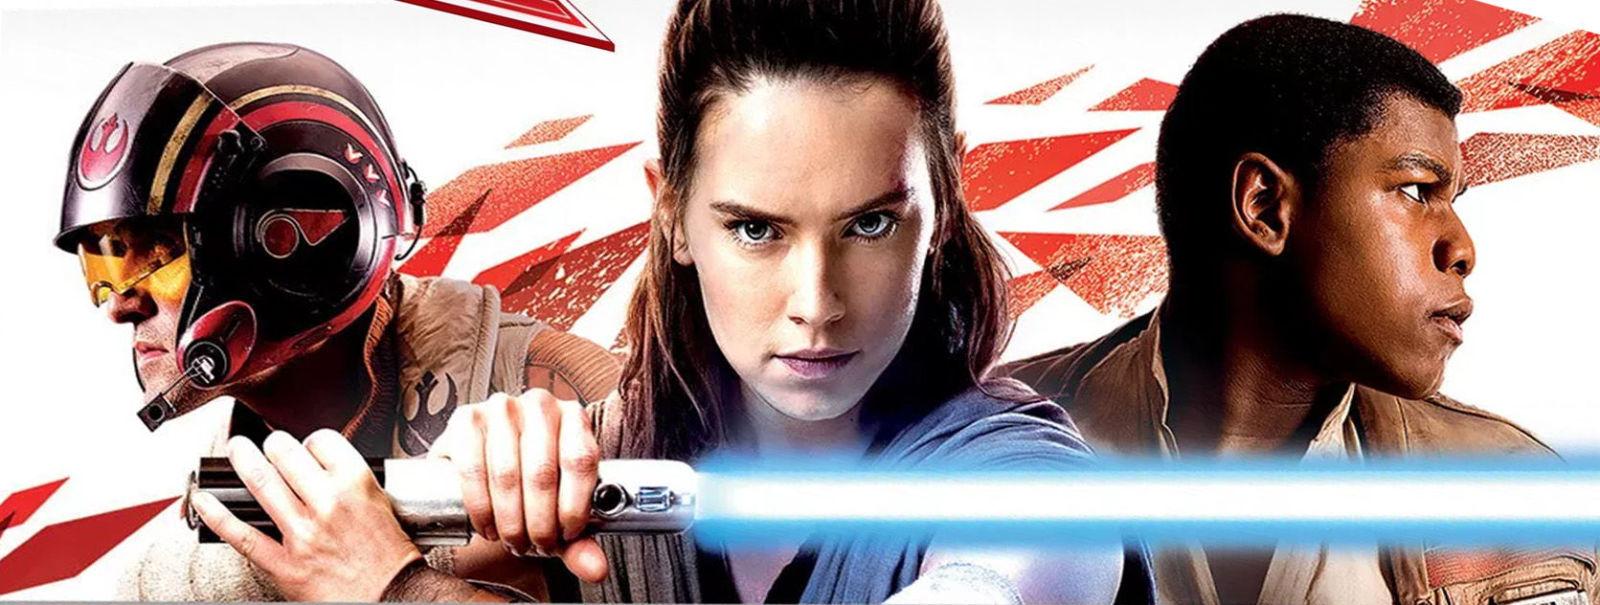 Star Wars The Last Jedi, Episode VIII, Teaser, Trailer, Sepculation